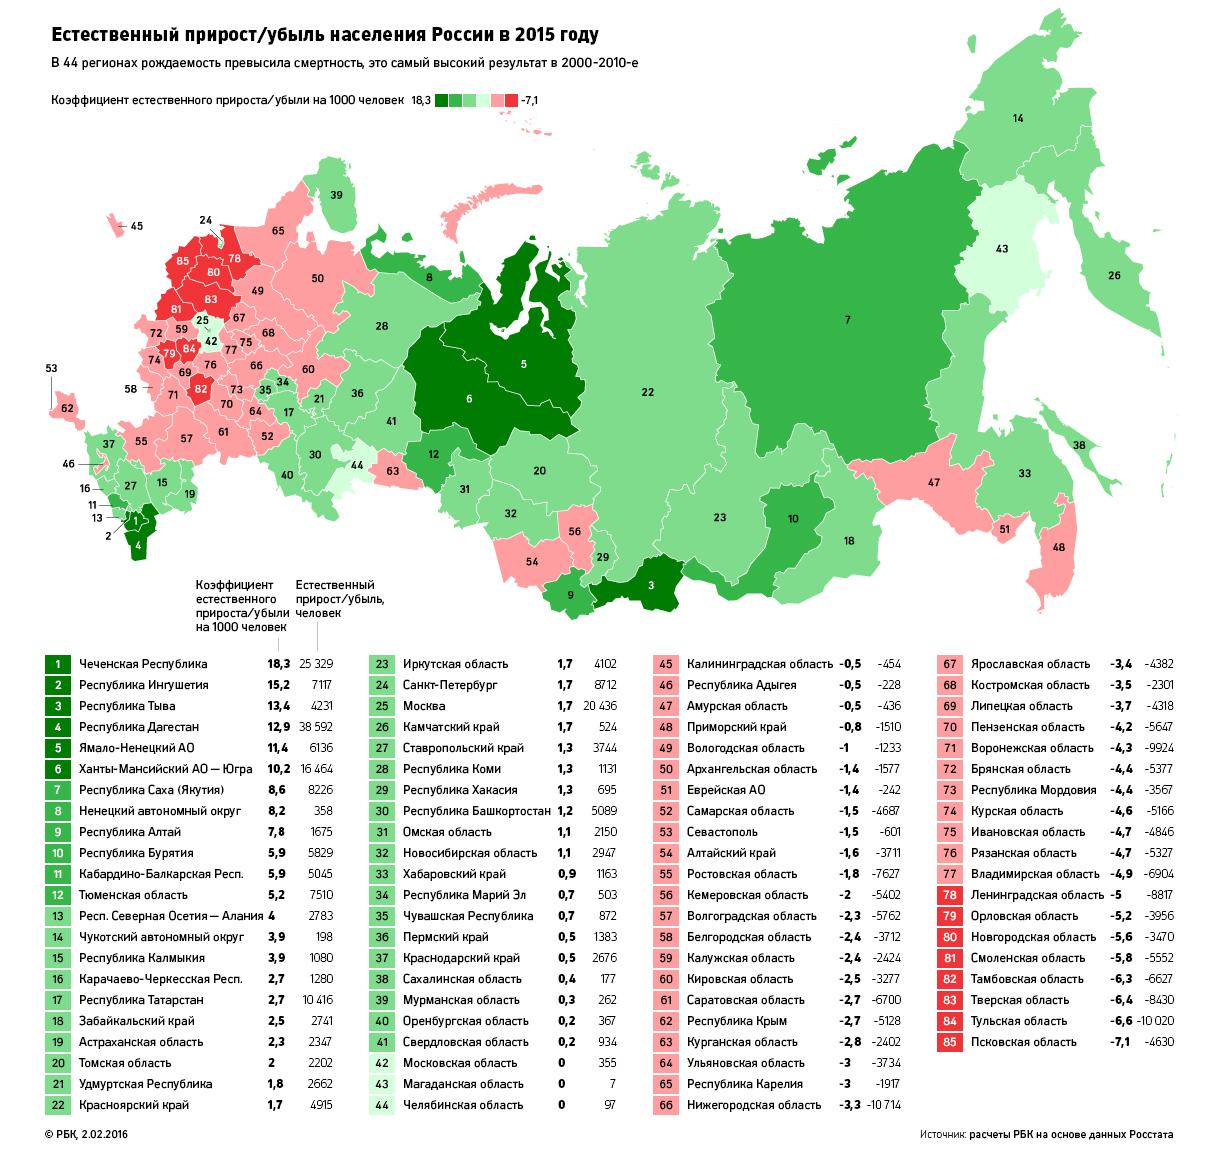 http://pics.v6.top.rbk.ru/v6_top_pics/media/img/1/82/754544916446821.jpg